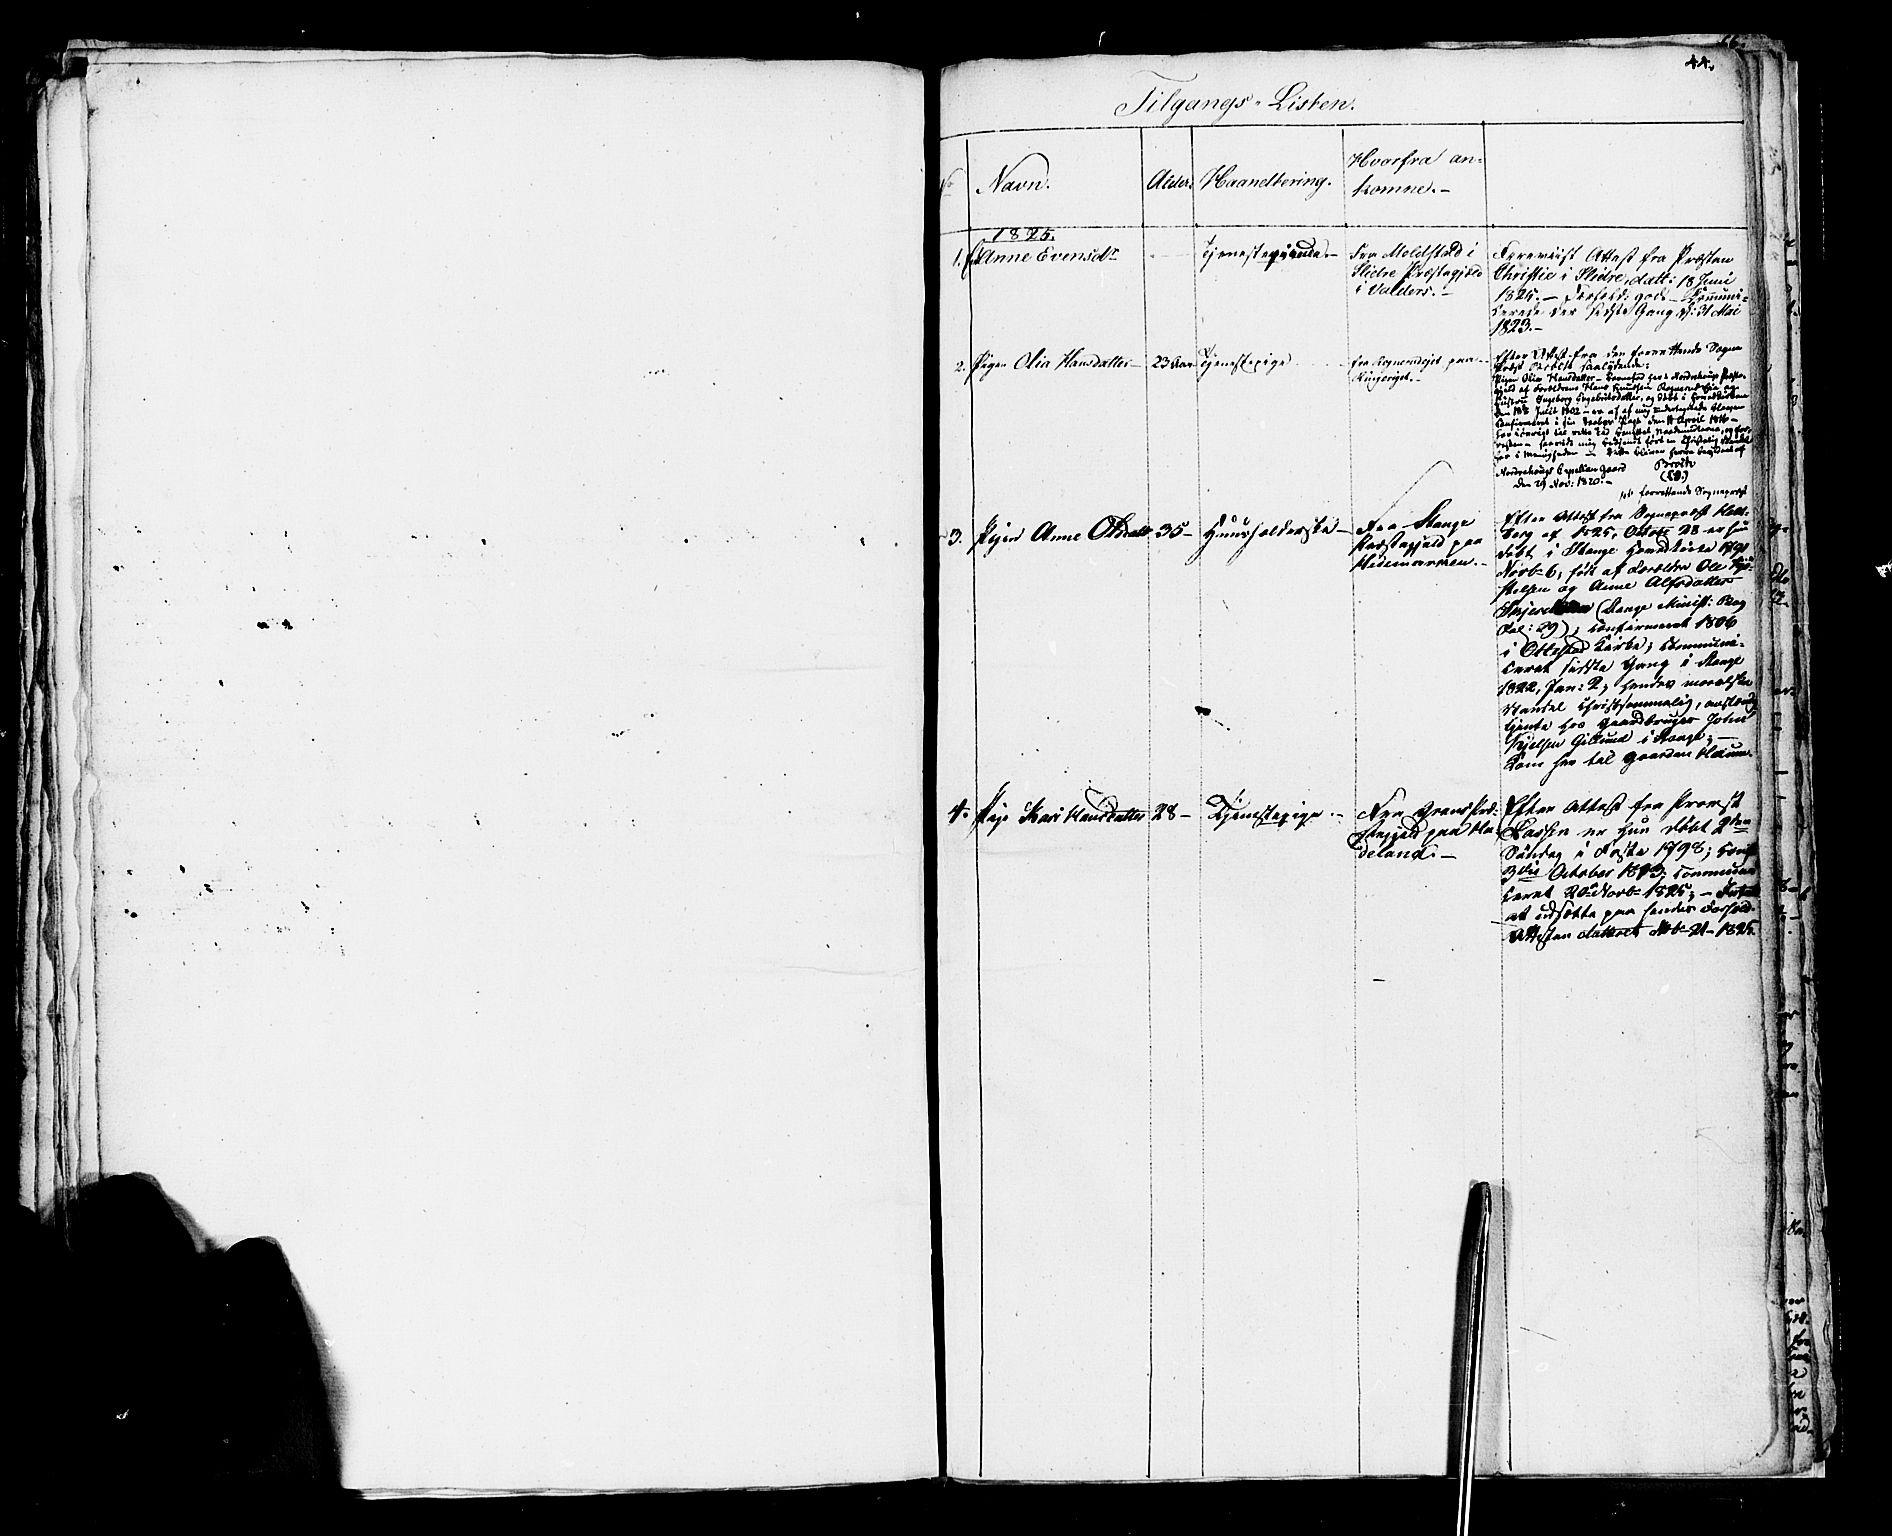 SAH, Vestre Toten prestekontor, H/Ha/Haa/L0001: Ministerialbok nr. 1, 1825-1826, s. 44